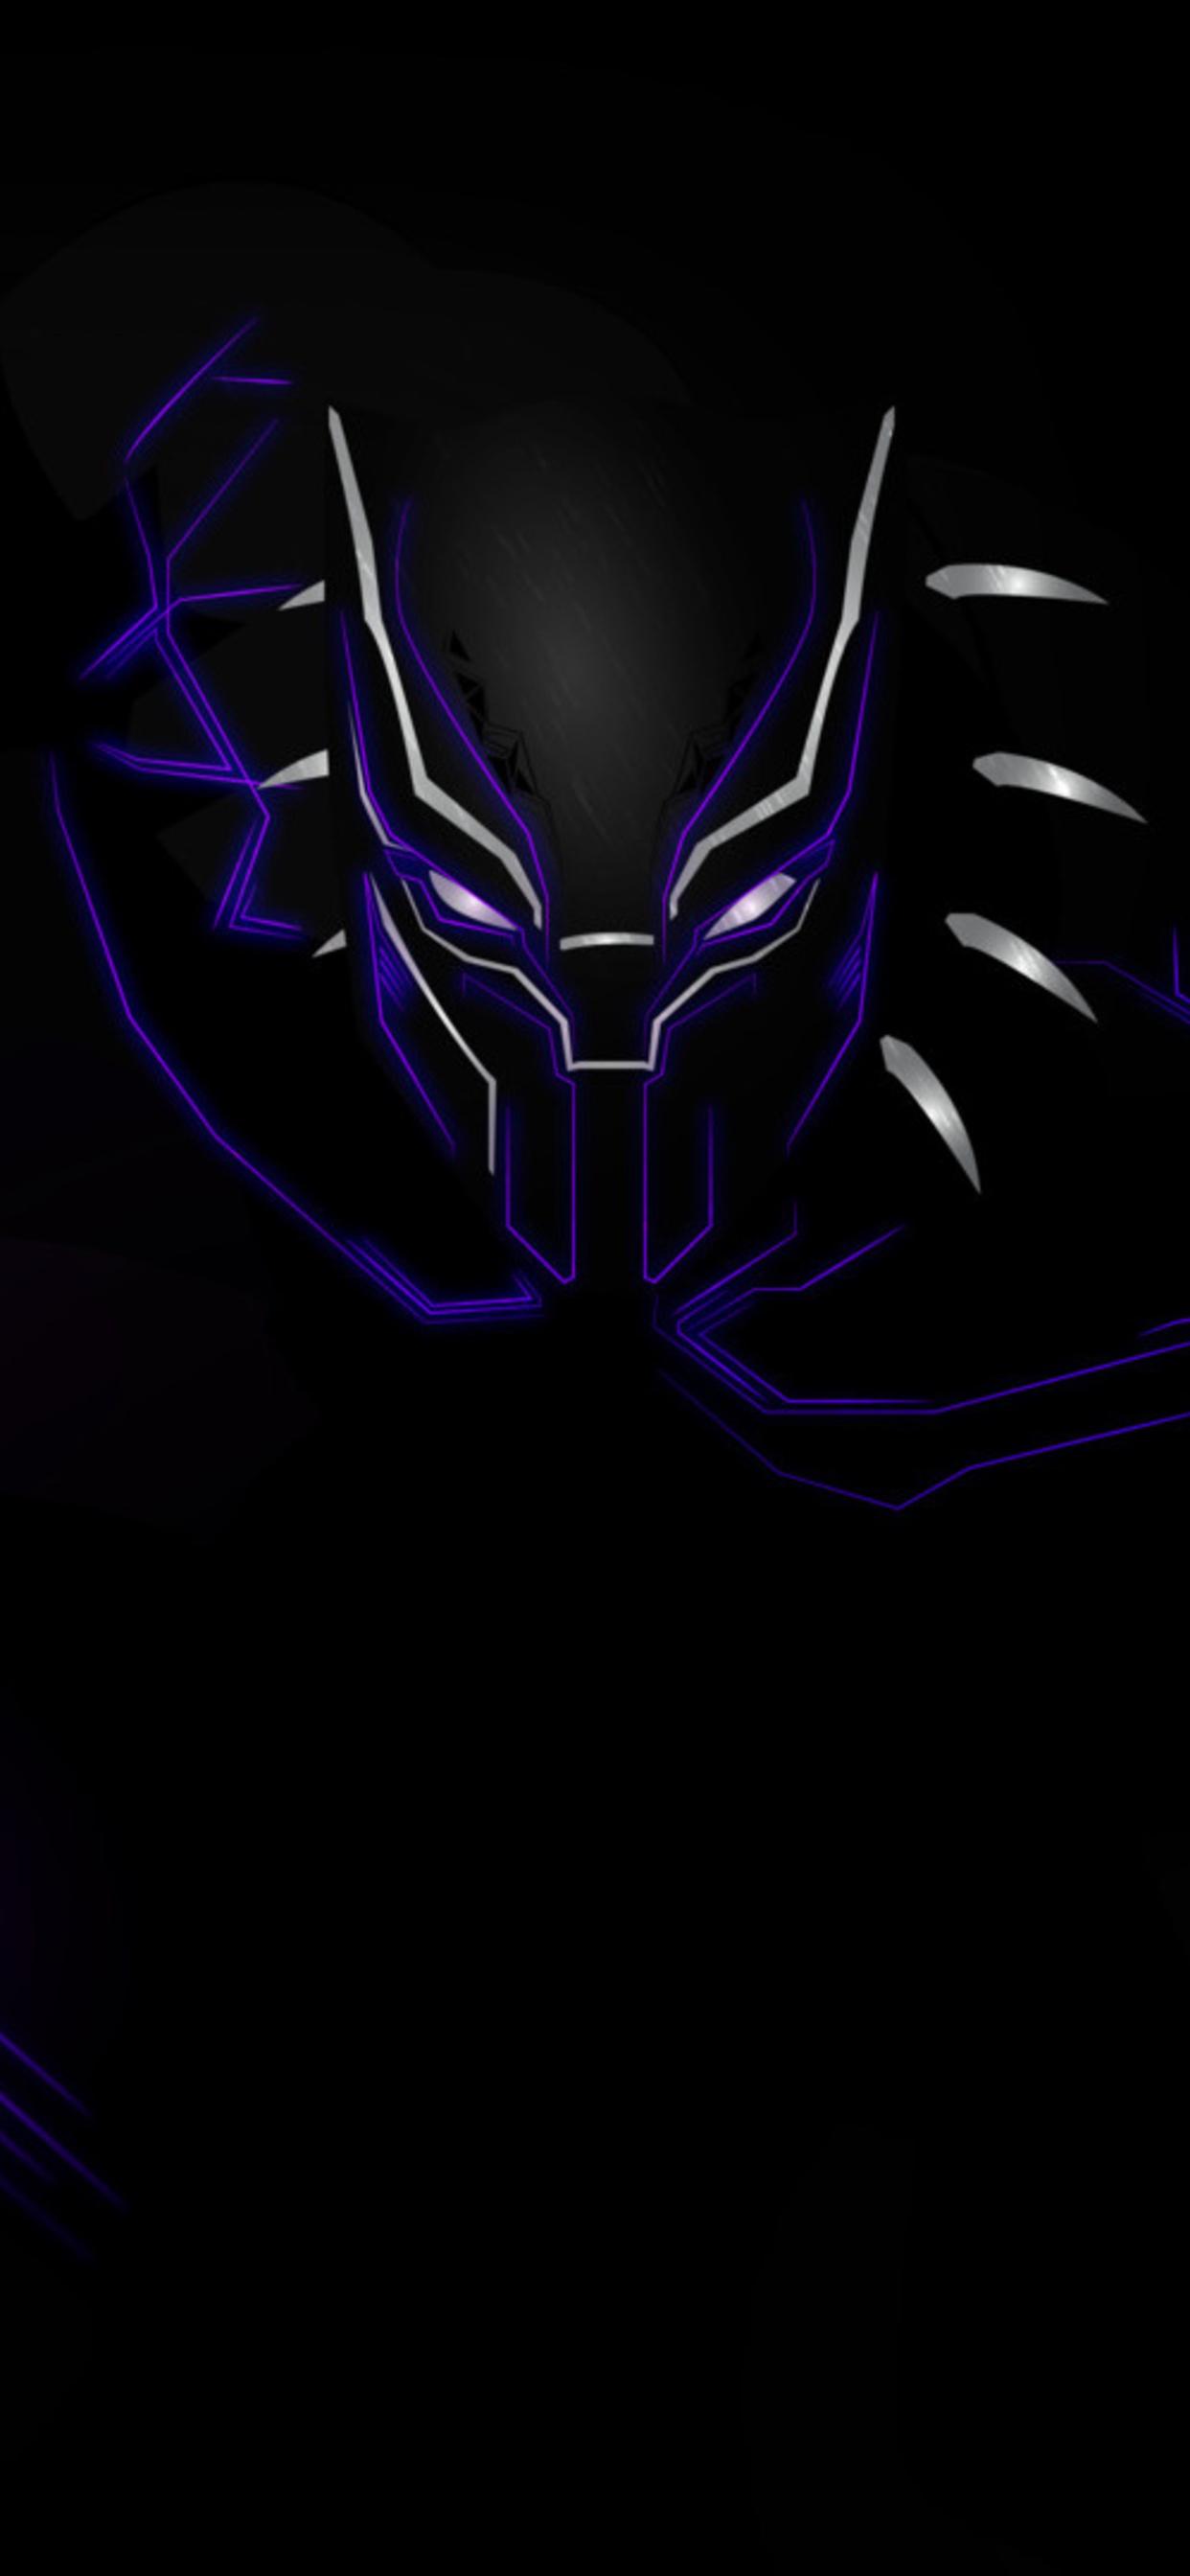 1242x2688 Black Panther Art 1080p Iphone Xs Max Hd 4k